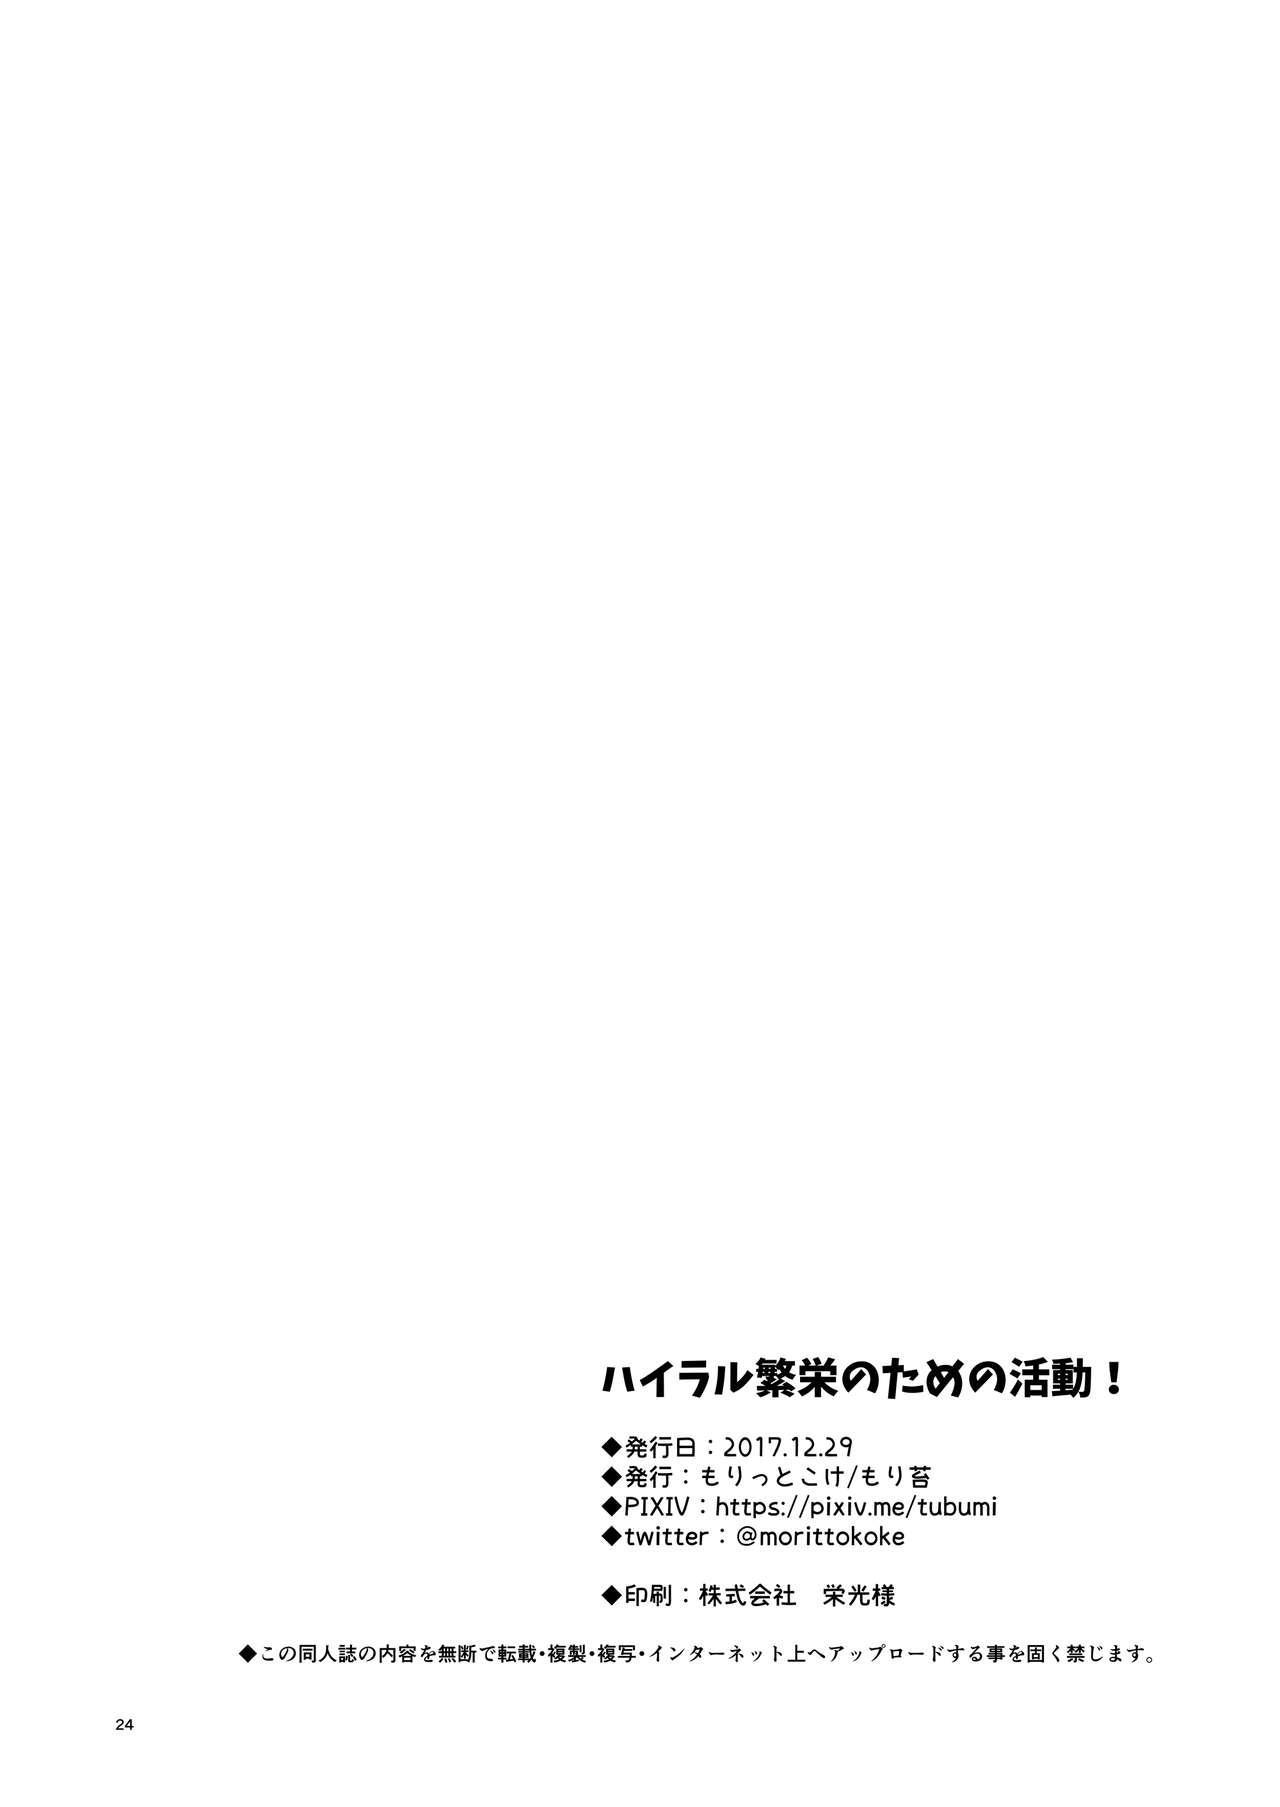 Hyrule Hanei no Tame no Katsudou!   Taking Steps to Ensure Hyrule's Prosperity! 24